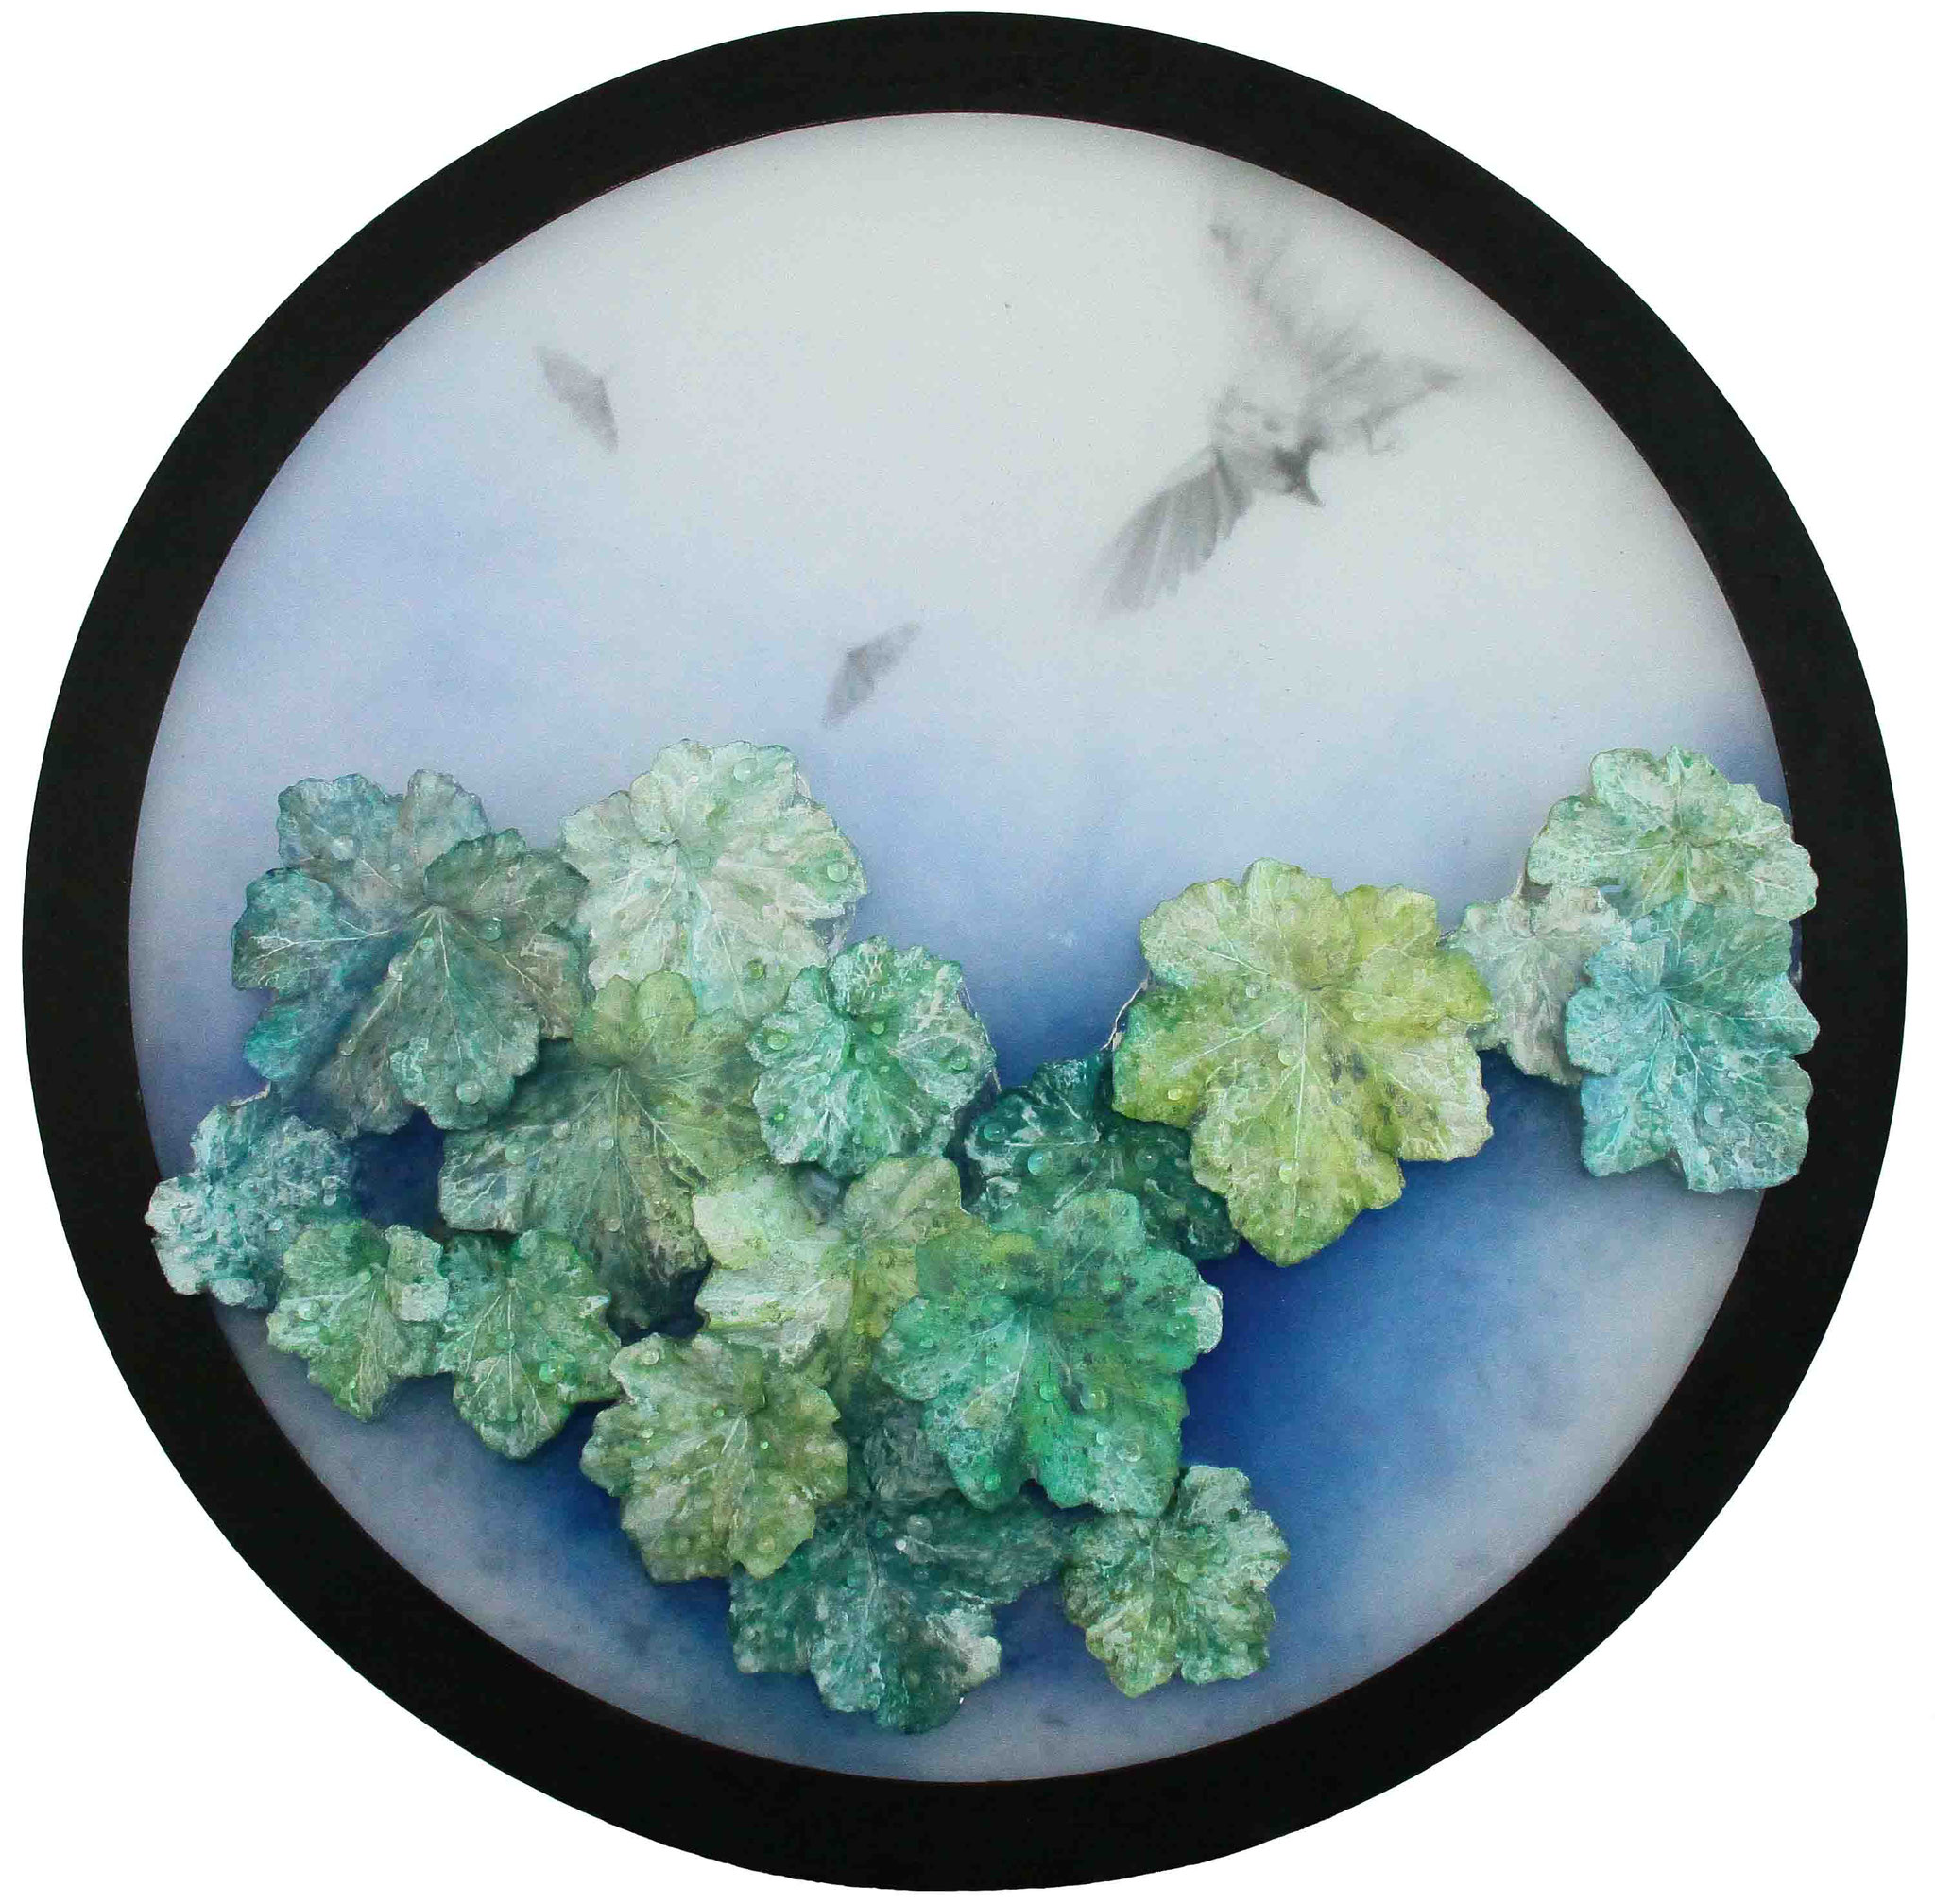 After the Rain~June~#1 (Heuchera) 2015/ 78cm×78cm×2.3cm / Kiln cast, Painted, Ink, Metal frame